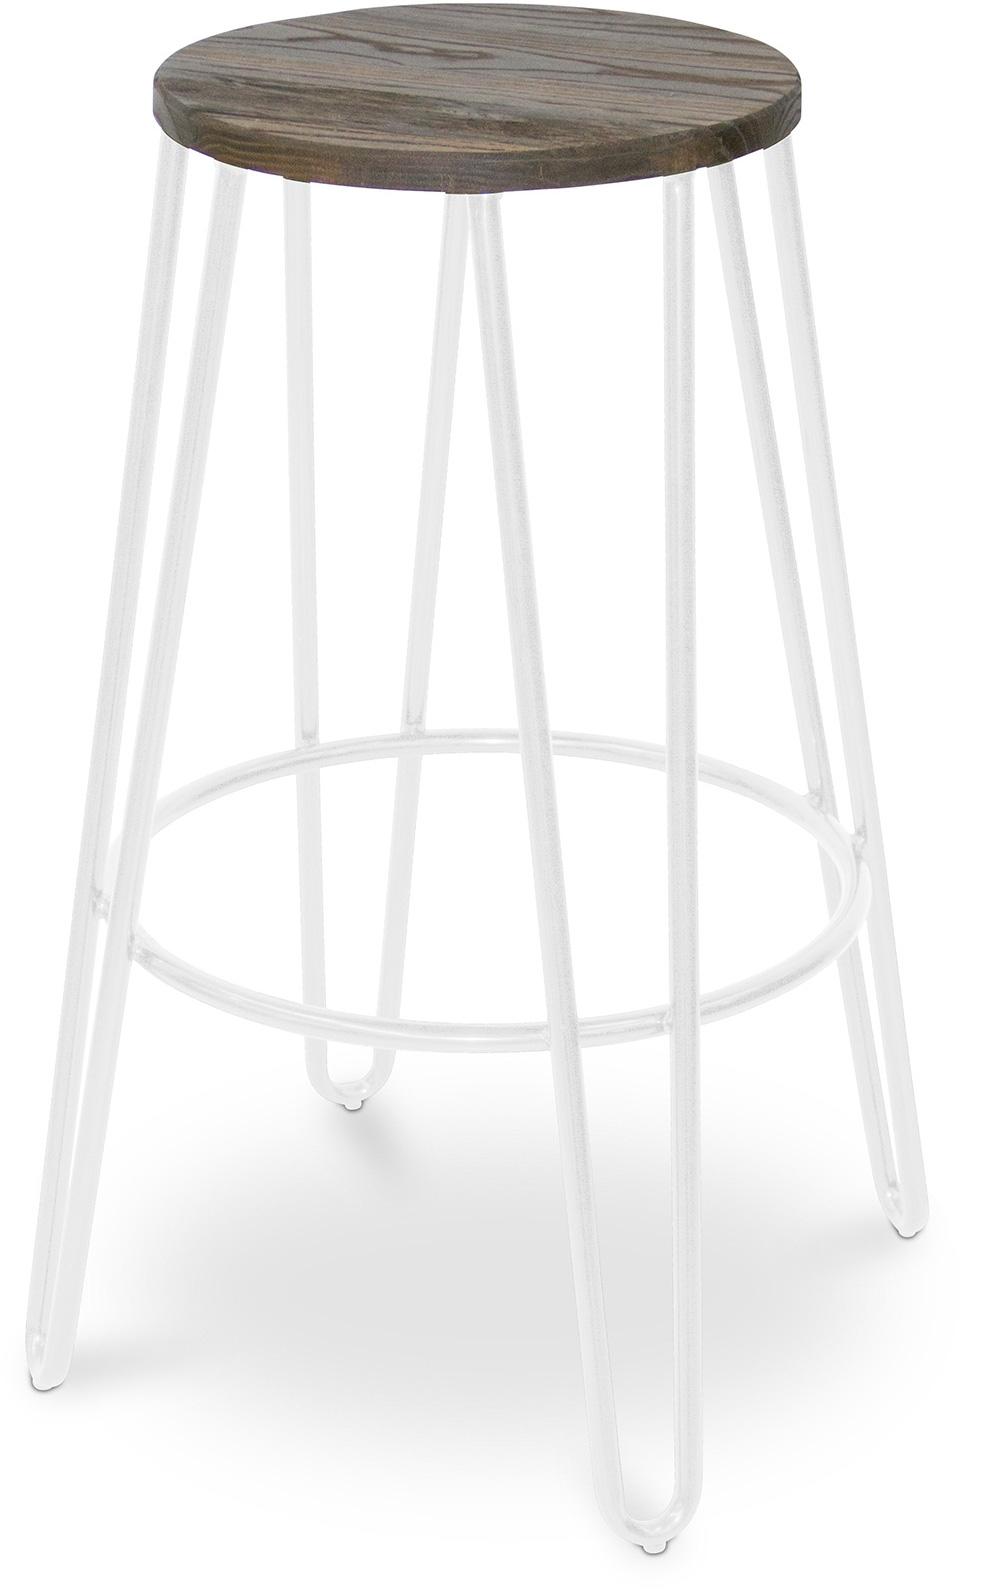 tabouret m tal blanc et assise bois fonc coffee. Black Bedroom Furniture Sets. Home Design Ideas